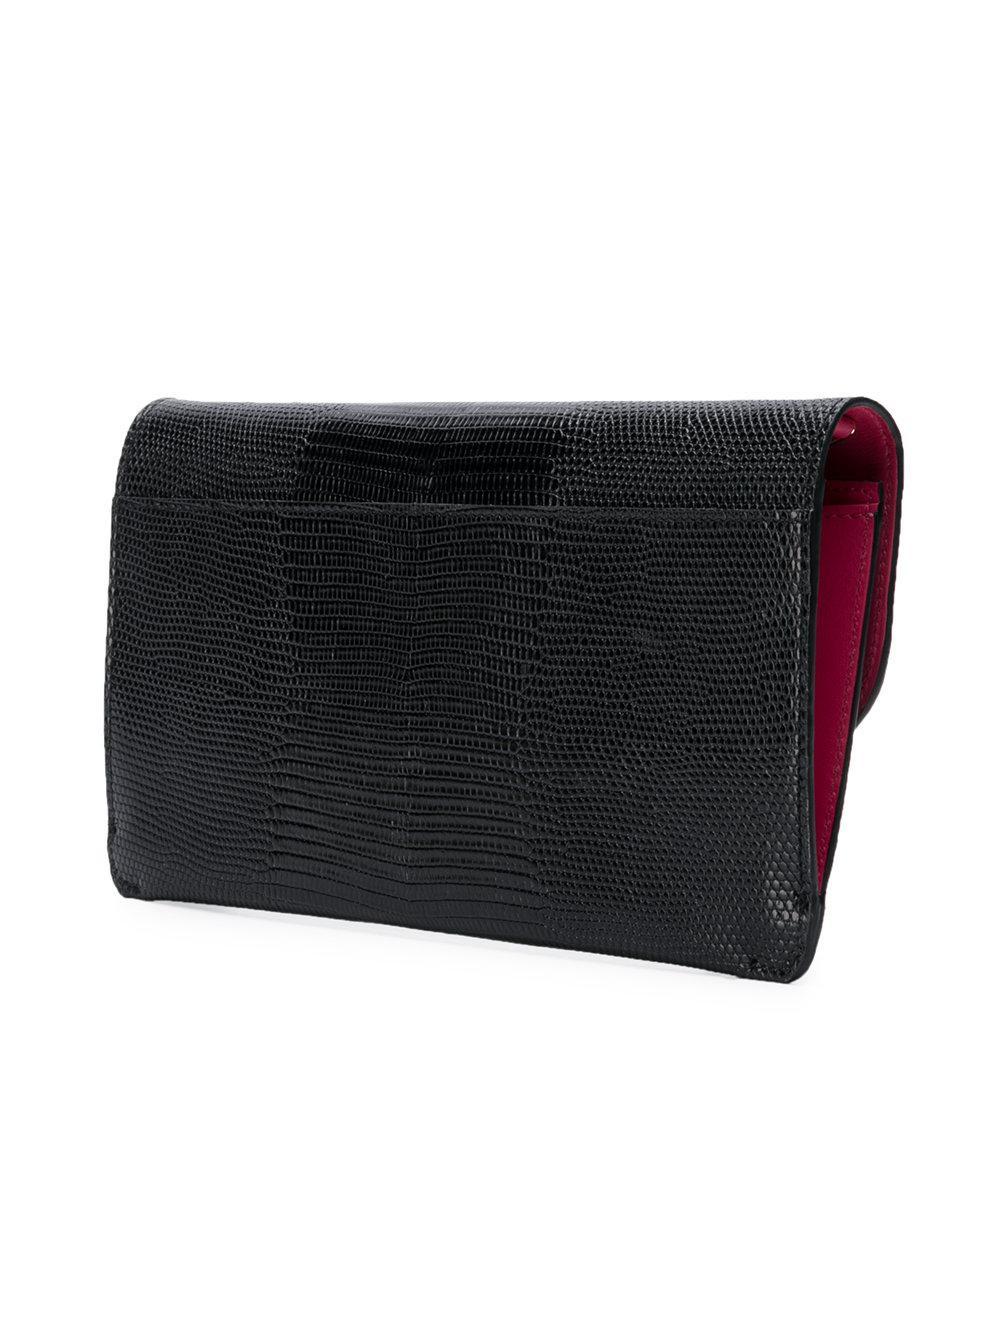 Dolce & Gabbana Leather Encrusted Dg Crossbody Bag in Black